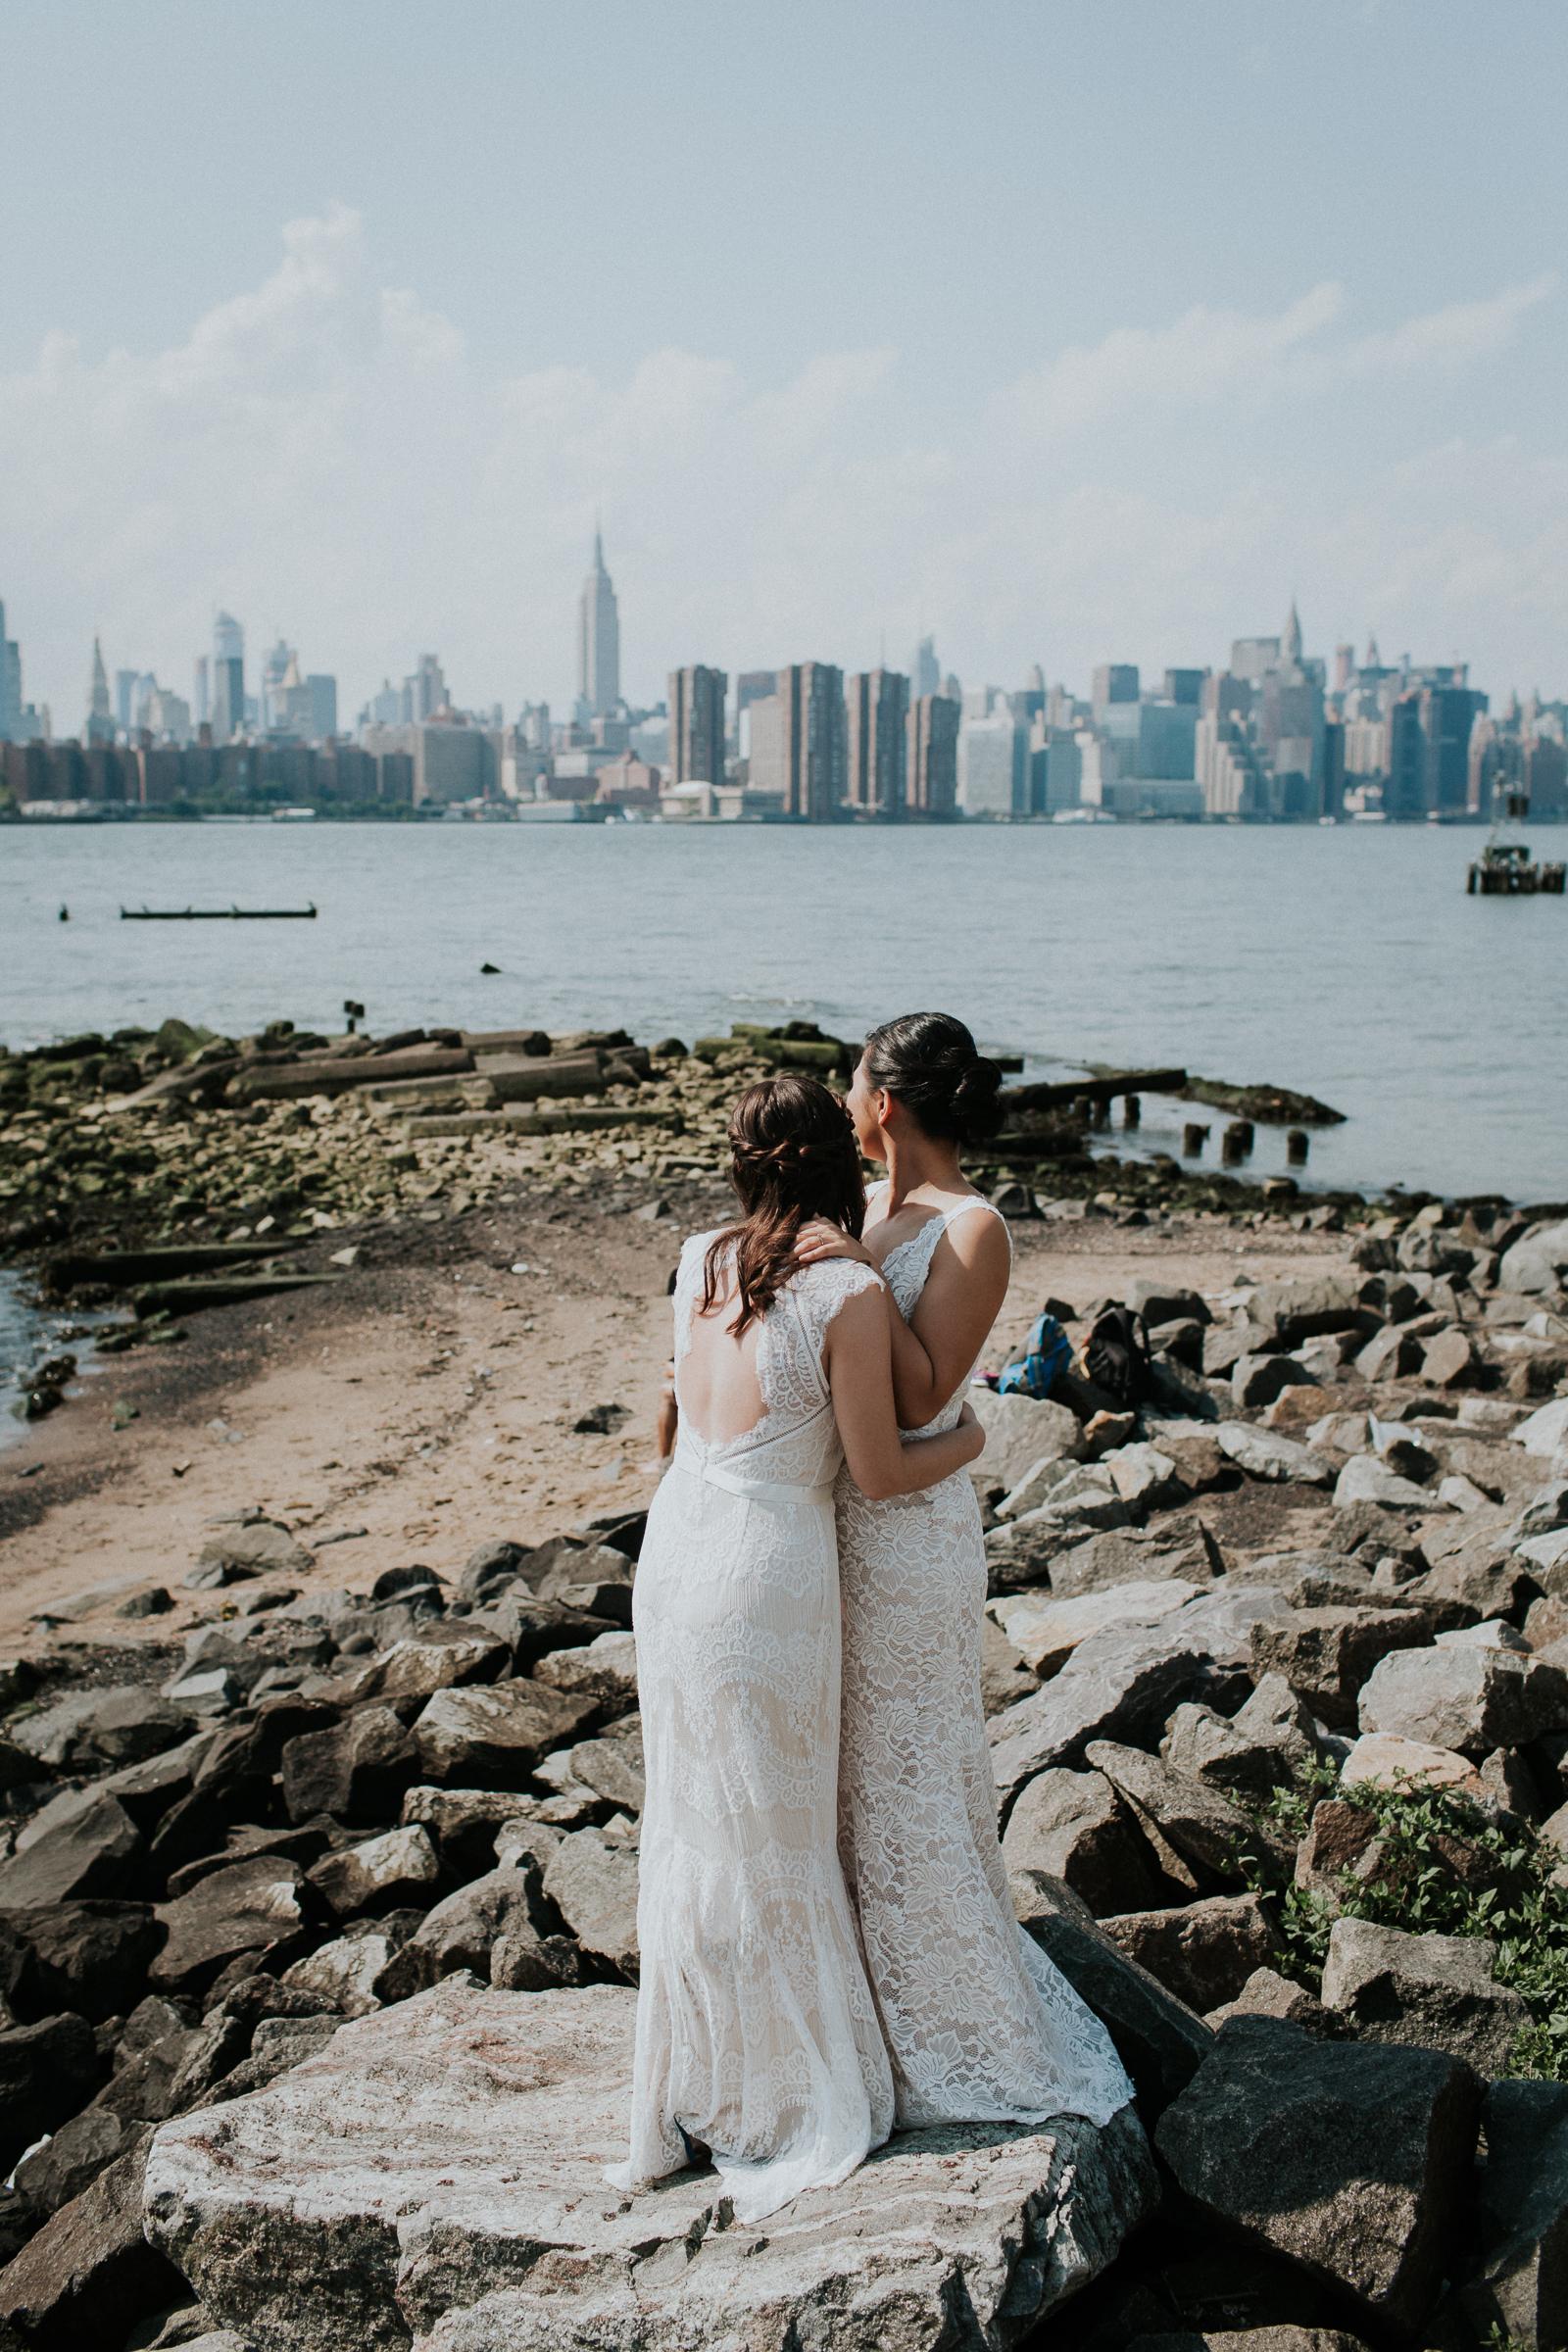 My-Moon-Brooklyn-LGBT-Gay-Documentary-Wedding-Photographer-34.jpg